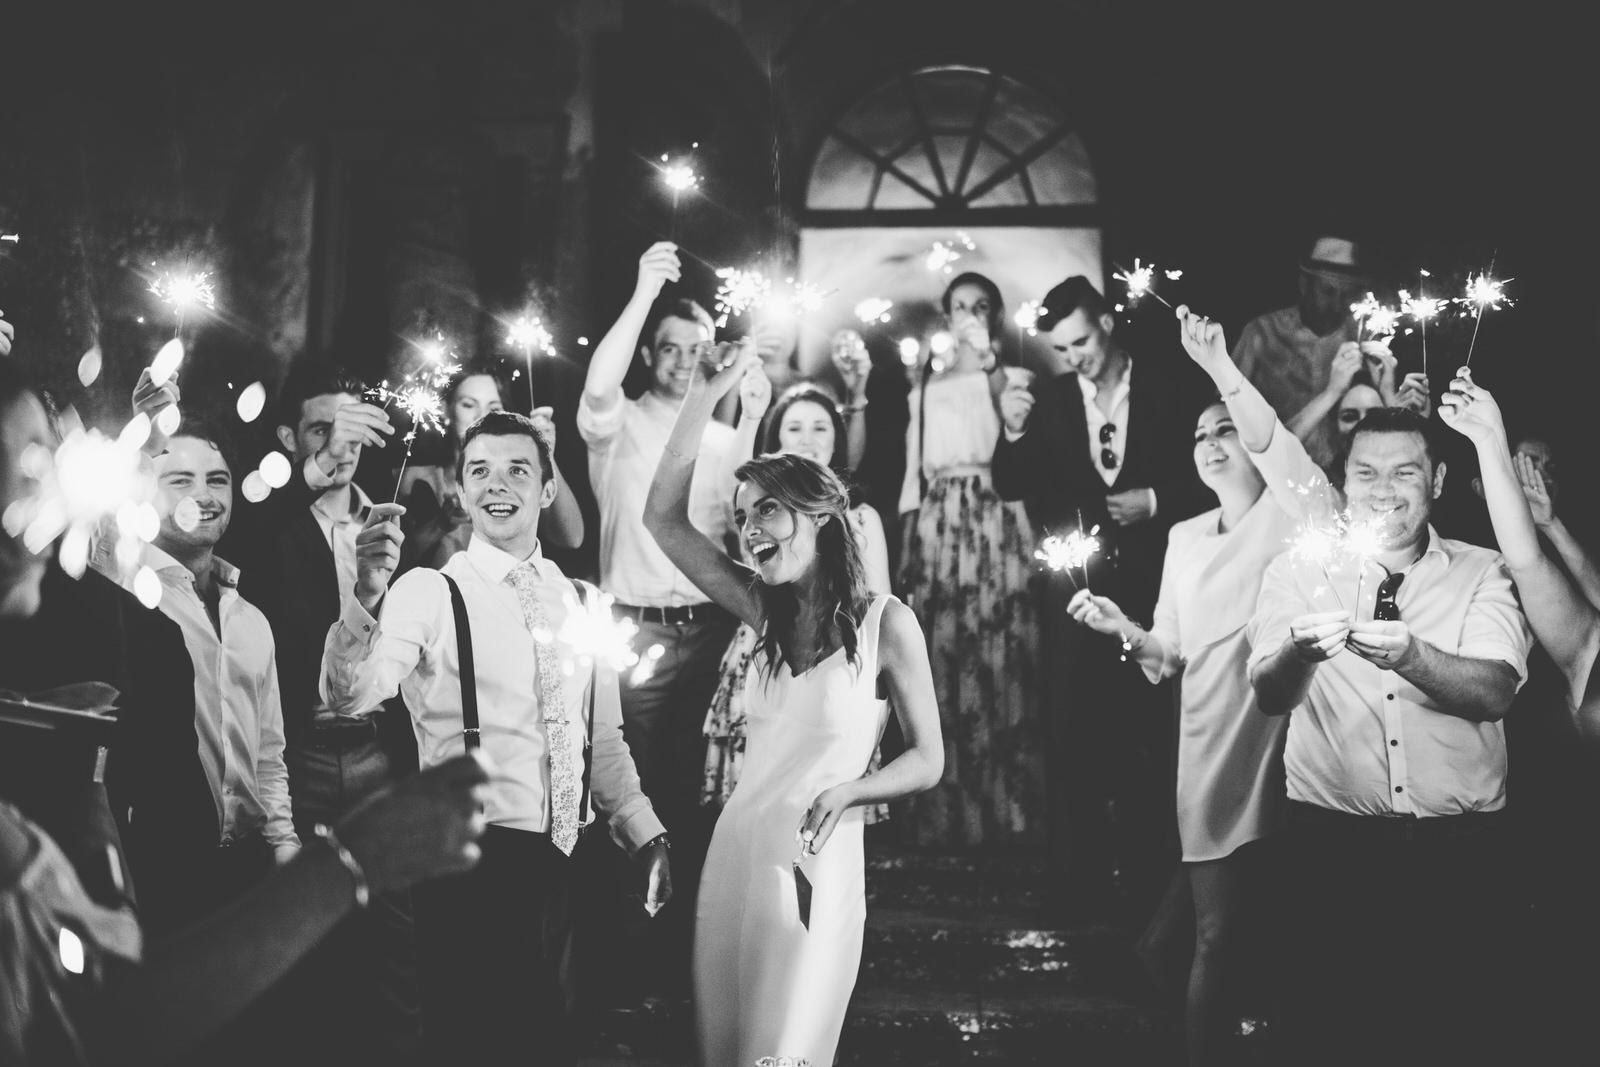 wedding photographer in italy-venice-tuscany-florence-amalfi coast-como lake-villa del balbianello-siena-amalfi-ravello-belmond-villa cimbrone51